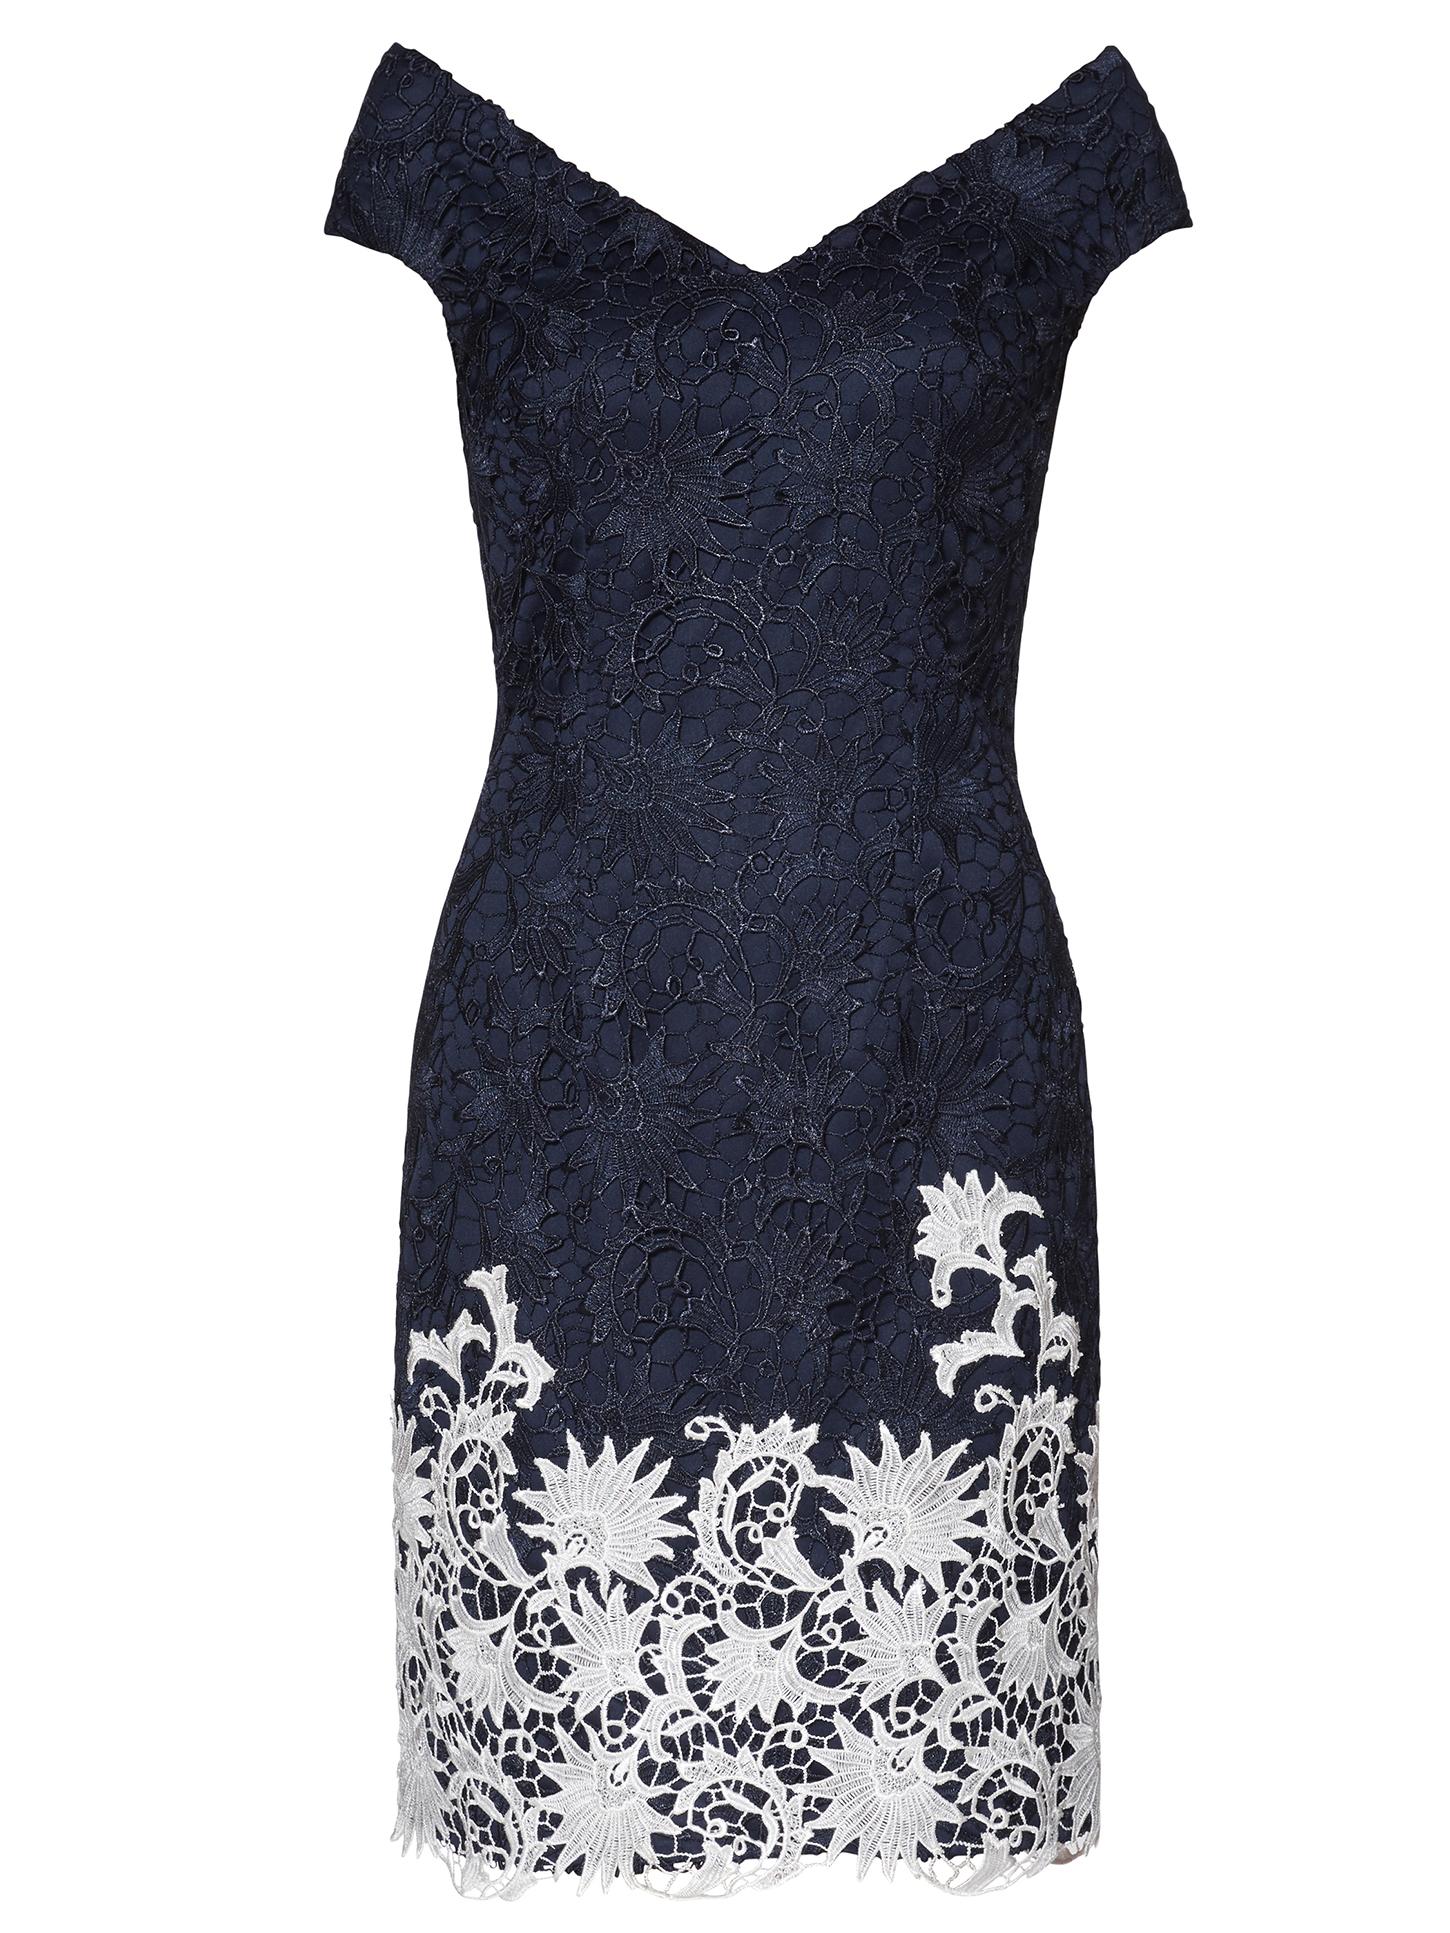 Anthea Contrast Lace Dress